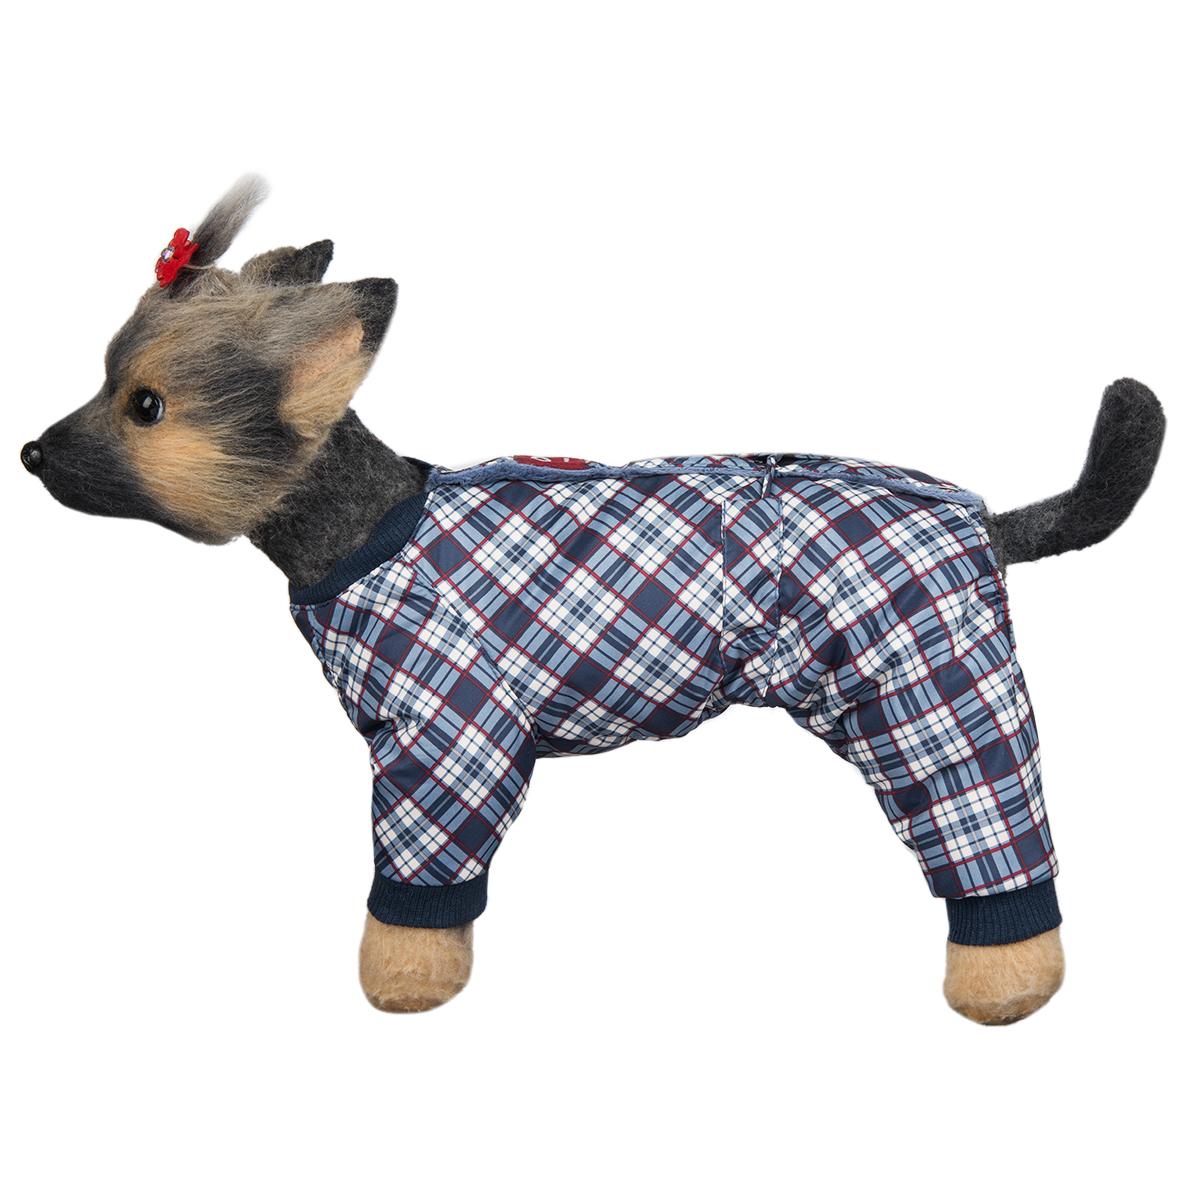 "Комбинезон для собак Dogmoda ""Нью-Йорк"", зимний, для мальчика, цвет: белый, темно-синий. Размер 2 (M)"